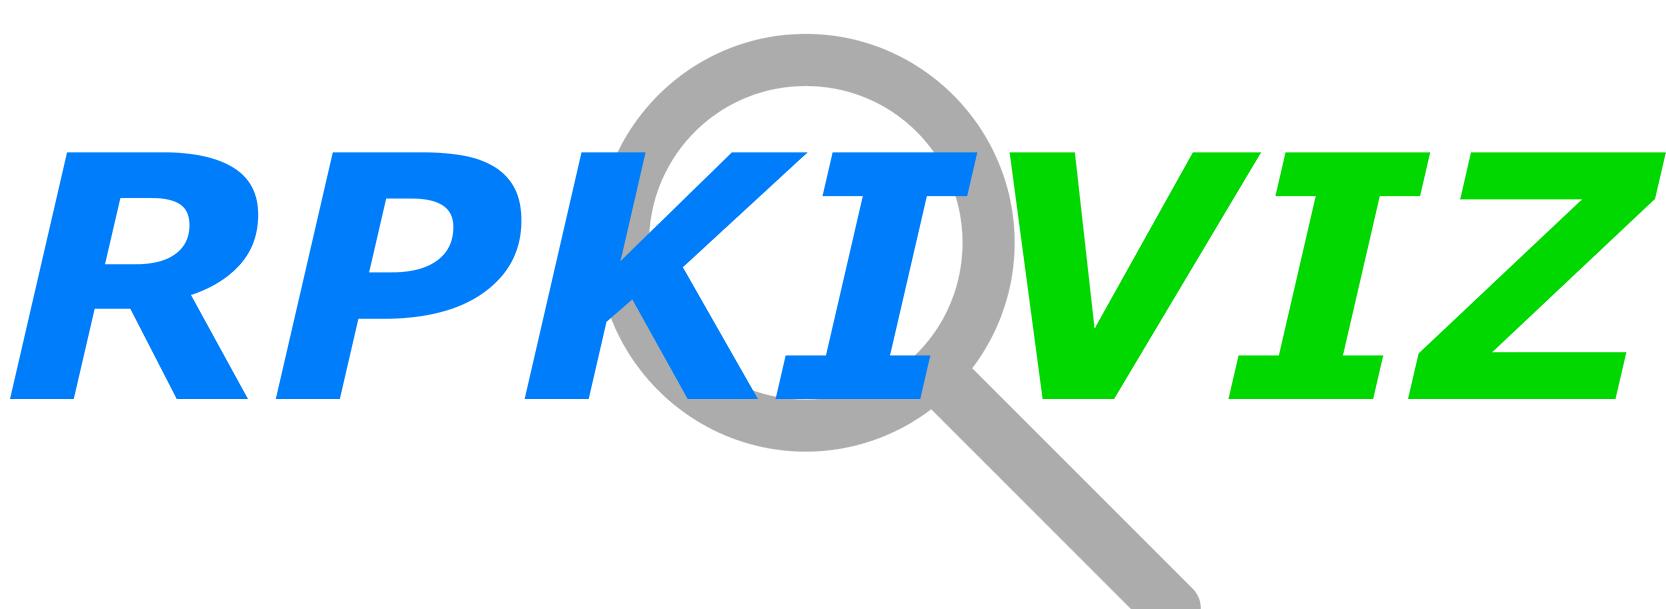 RPKIVIZ: Visualizing the RPKI